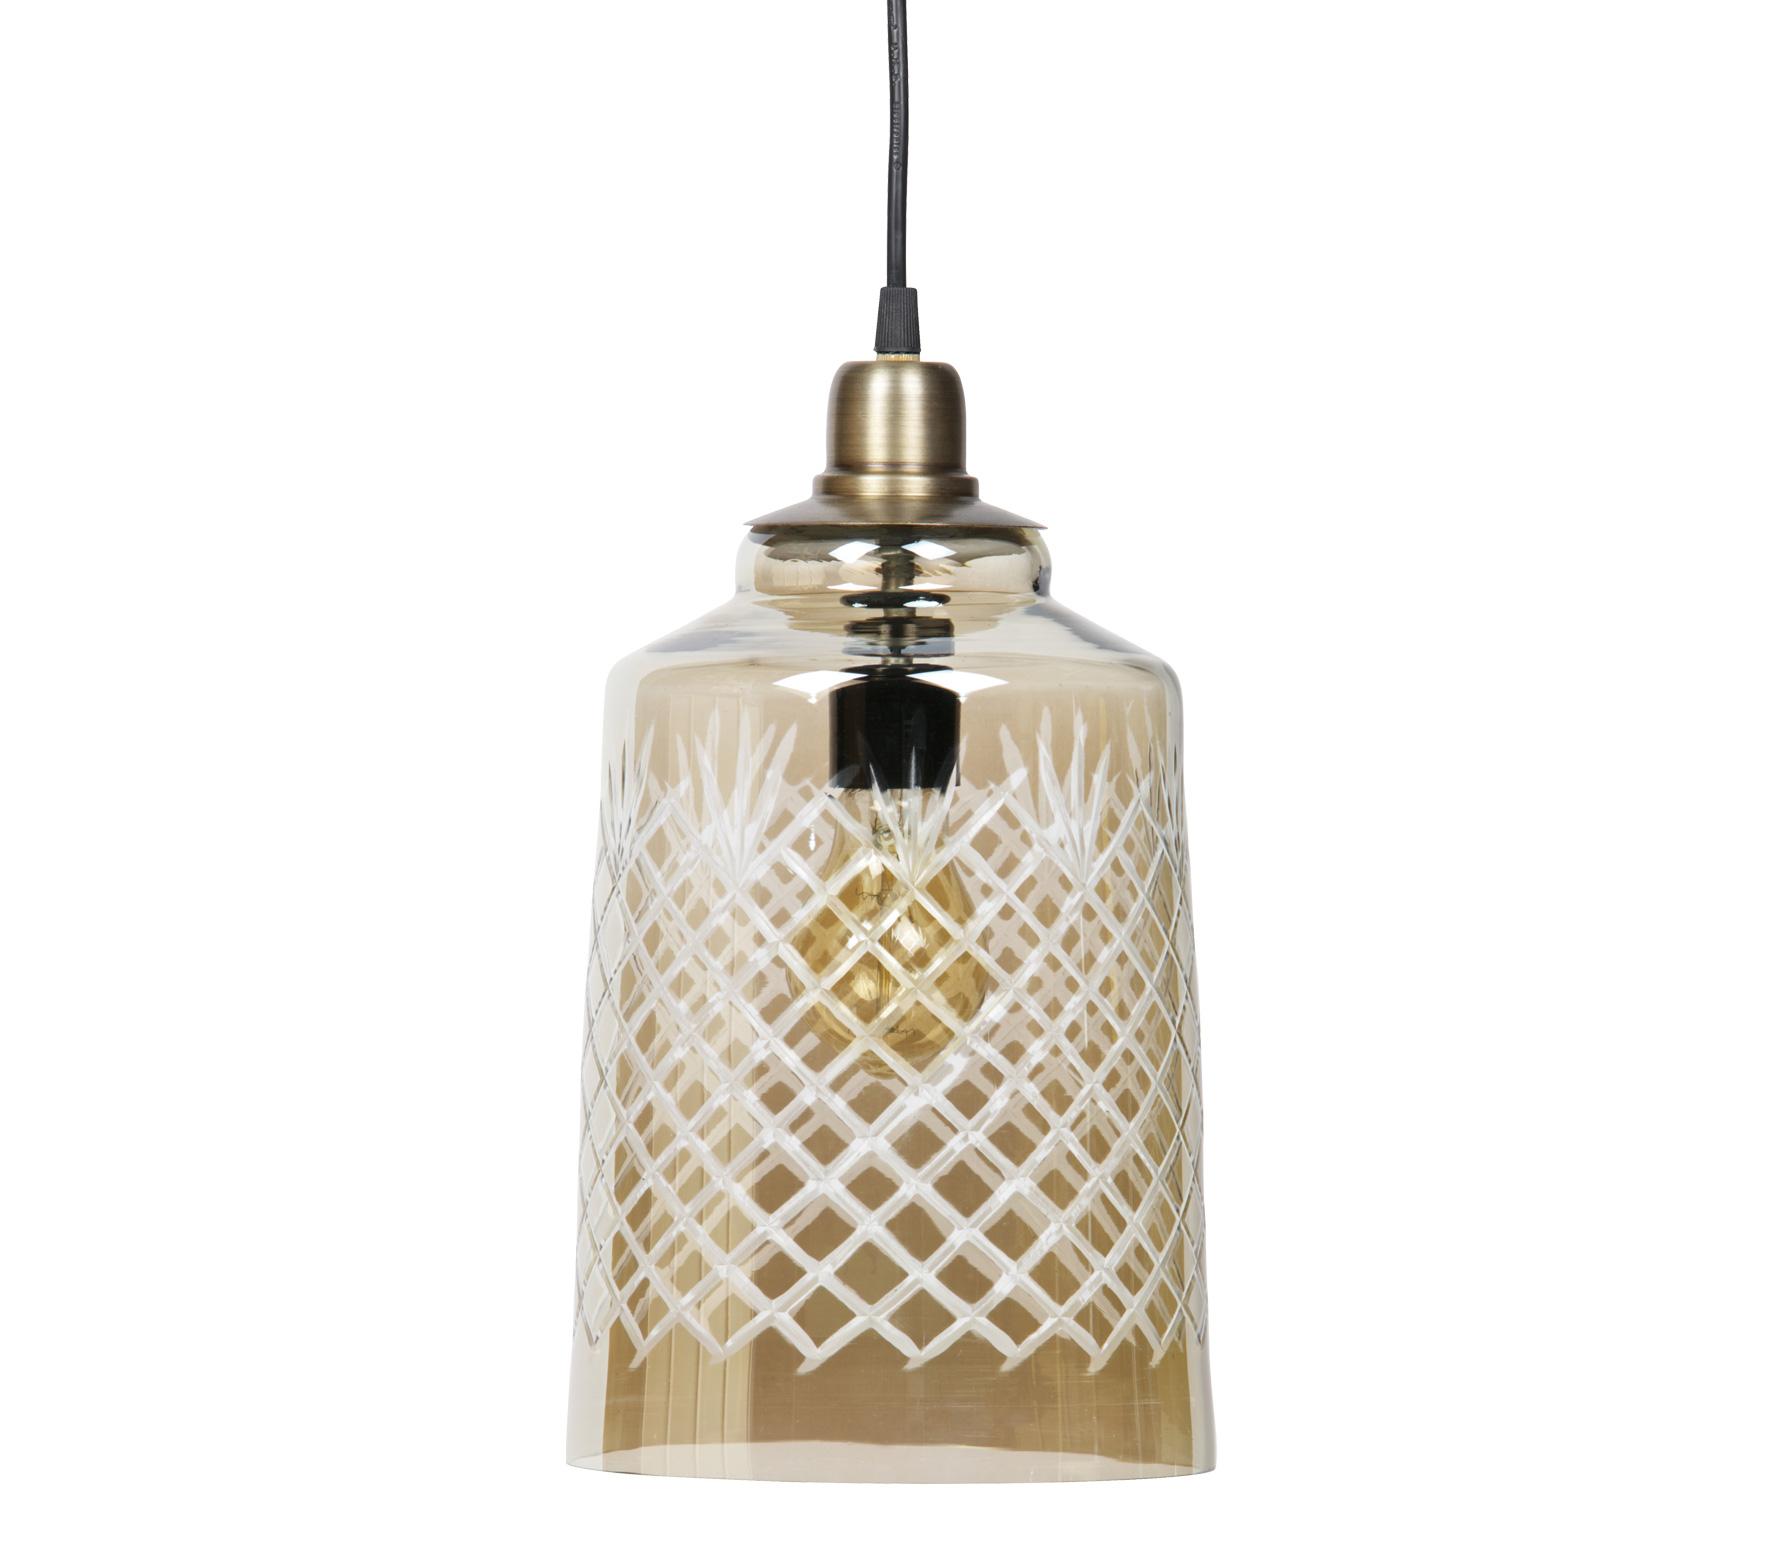 BePureHome Engrave hanglamp glas h33cm antique brass